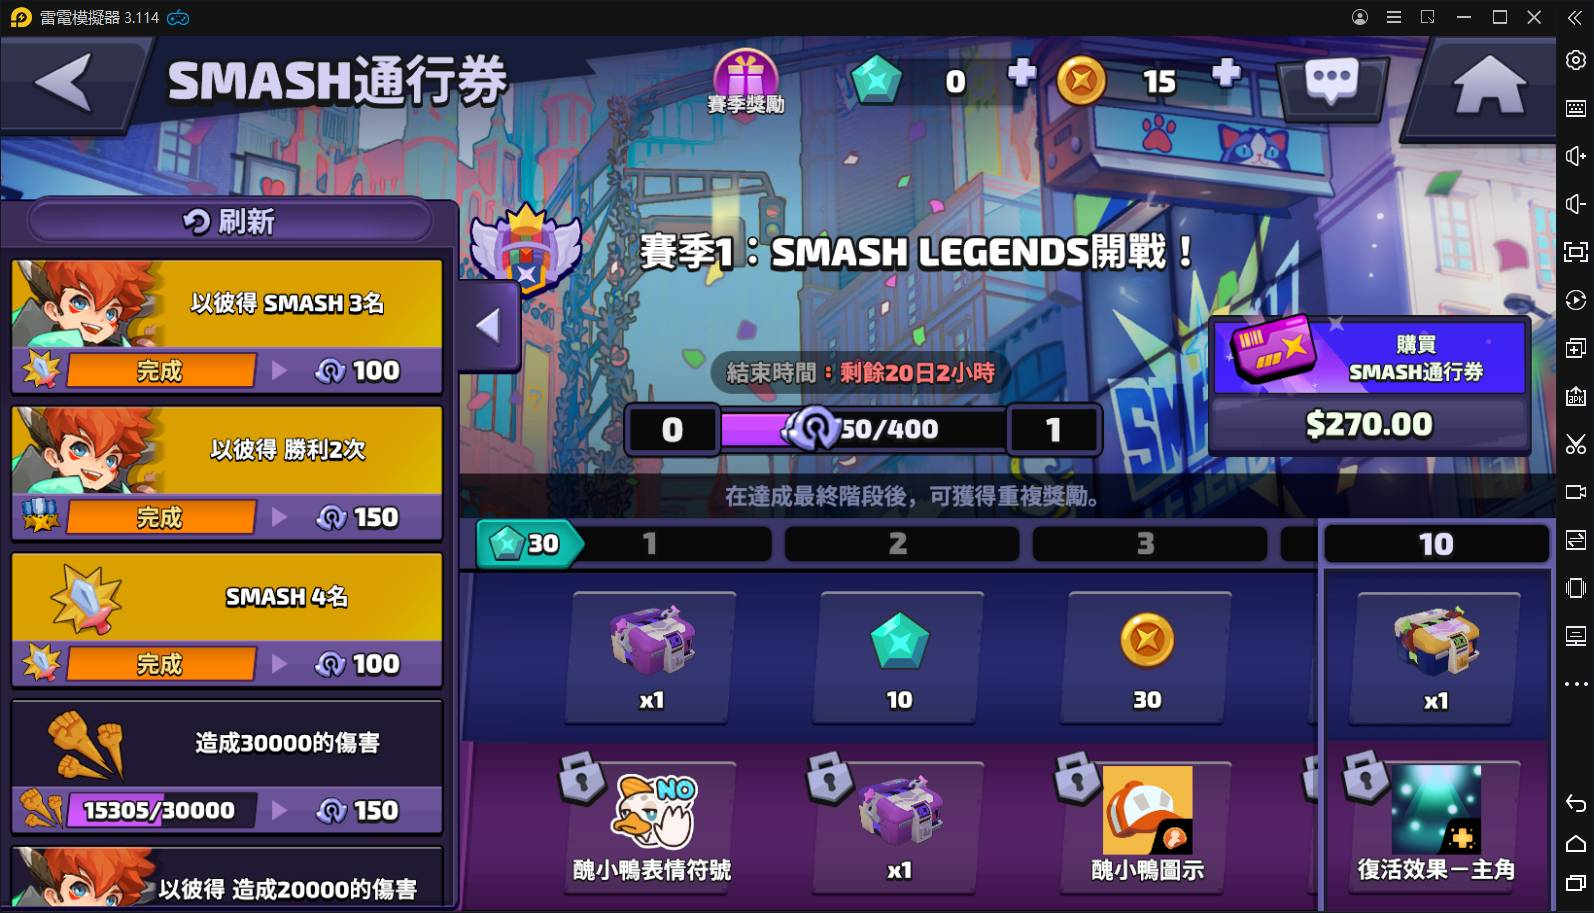 《SMASH LEGENDS:傳奇大亂鬥》遊戲玩法和技巧運用